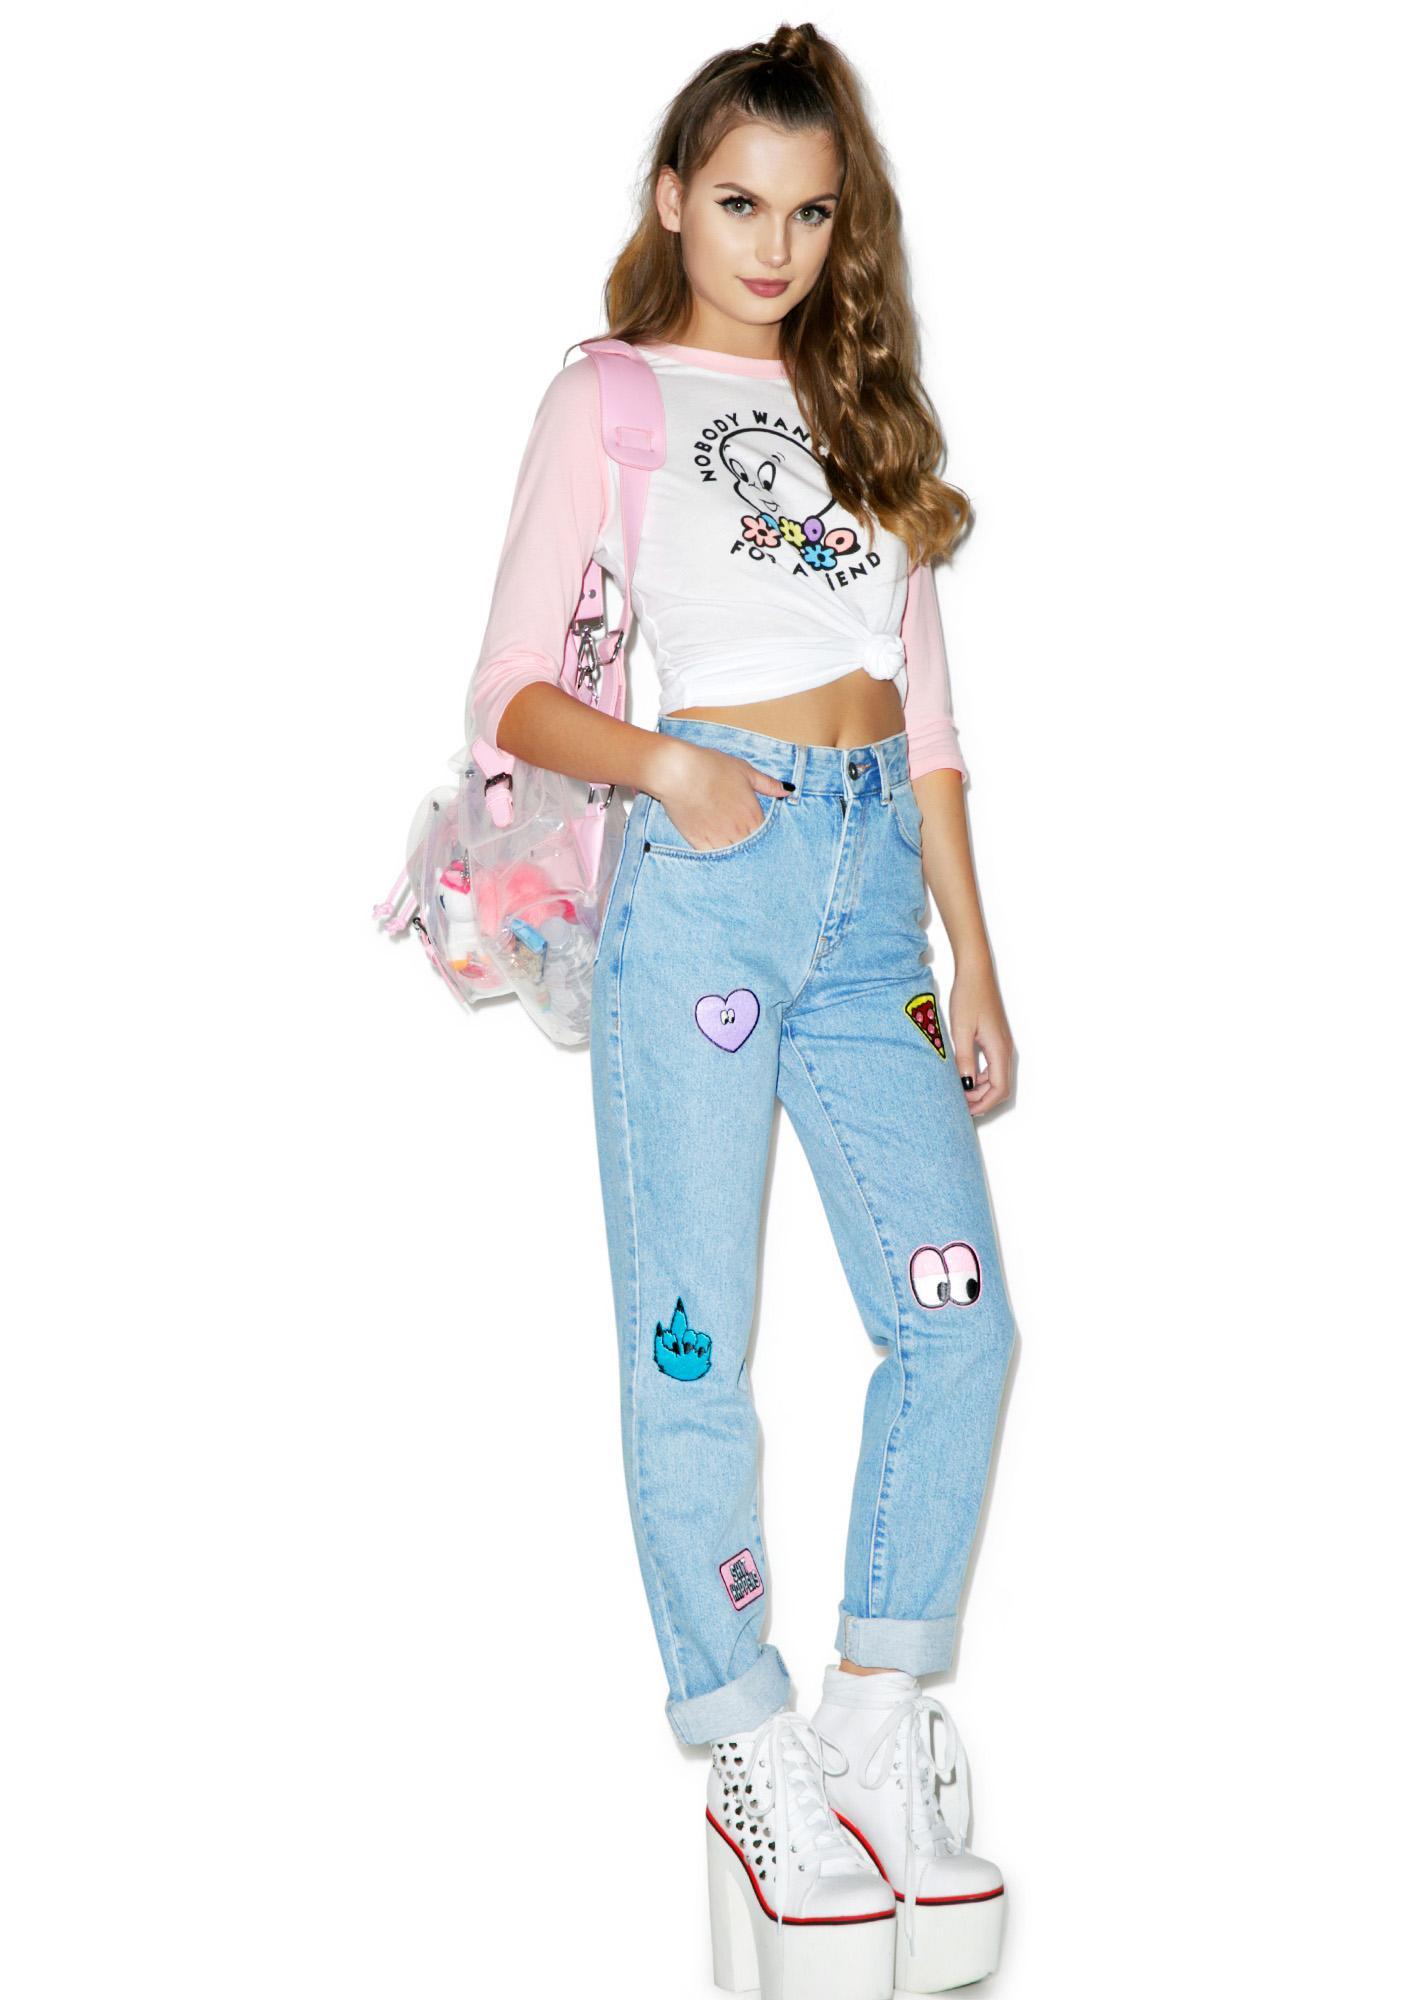 Lazy Oaf Collection Patch Jeans